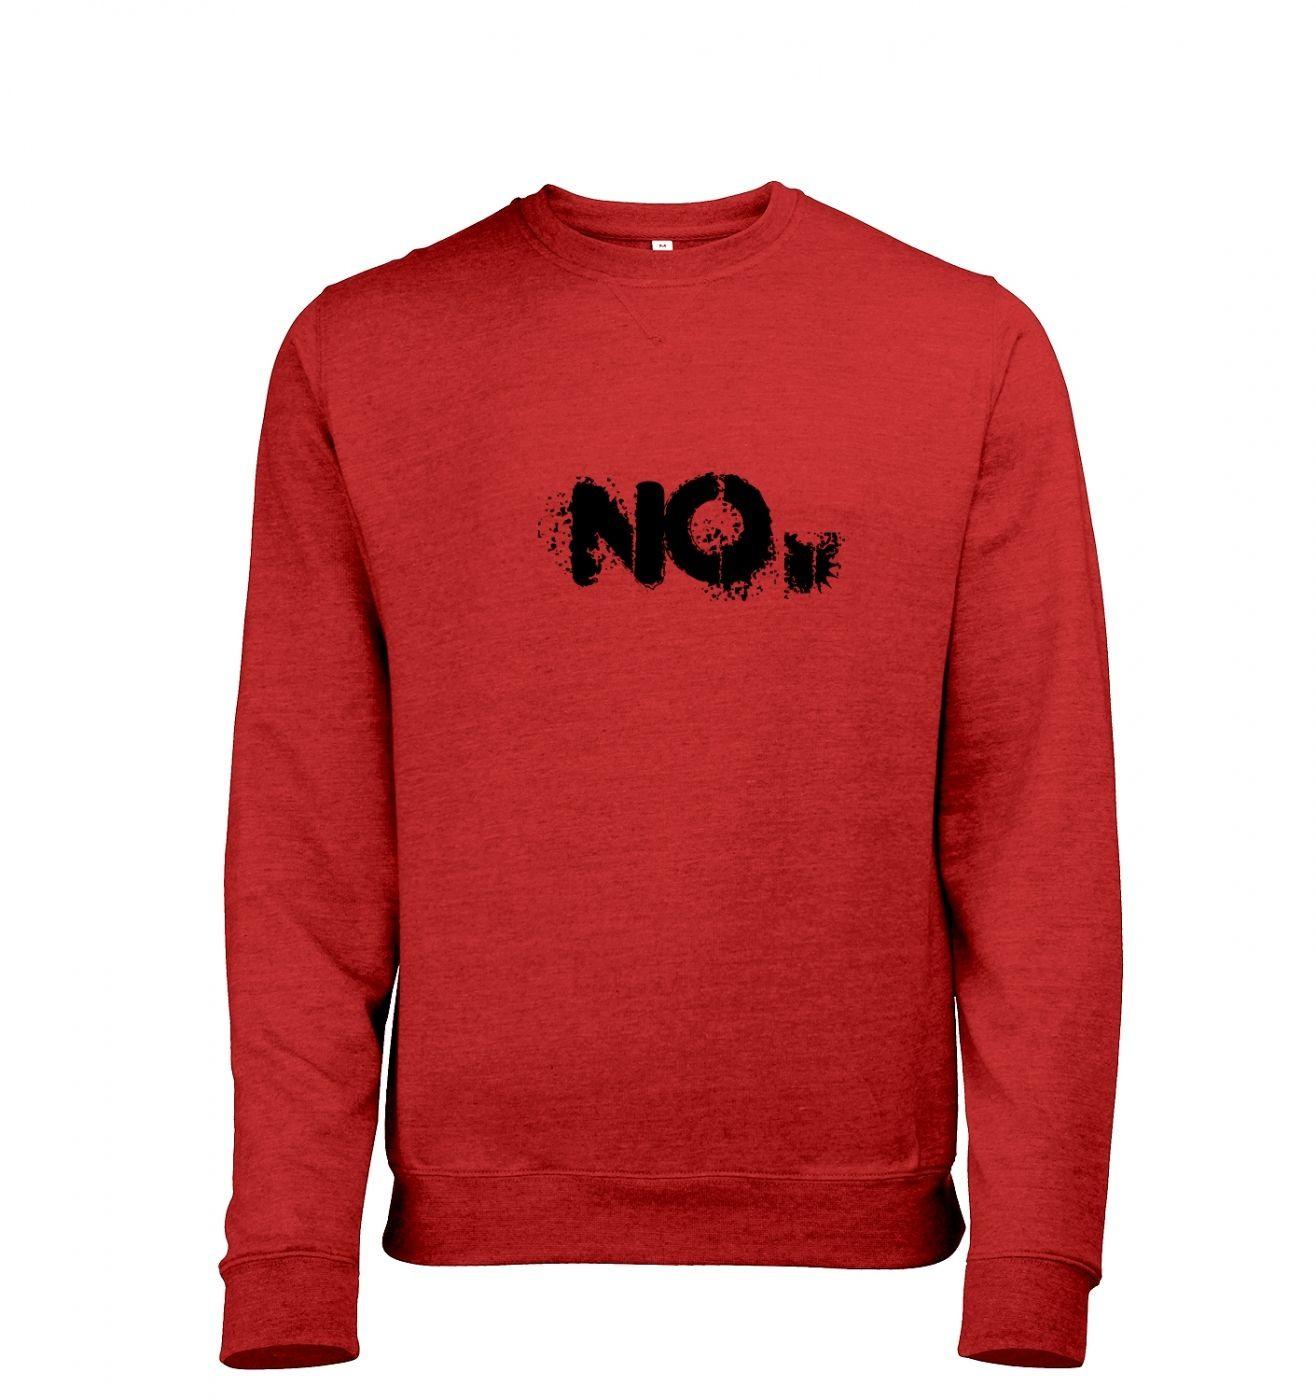 NO mens heather sweatshirt